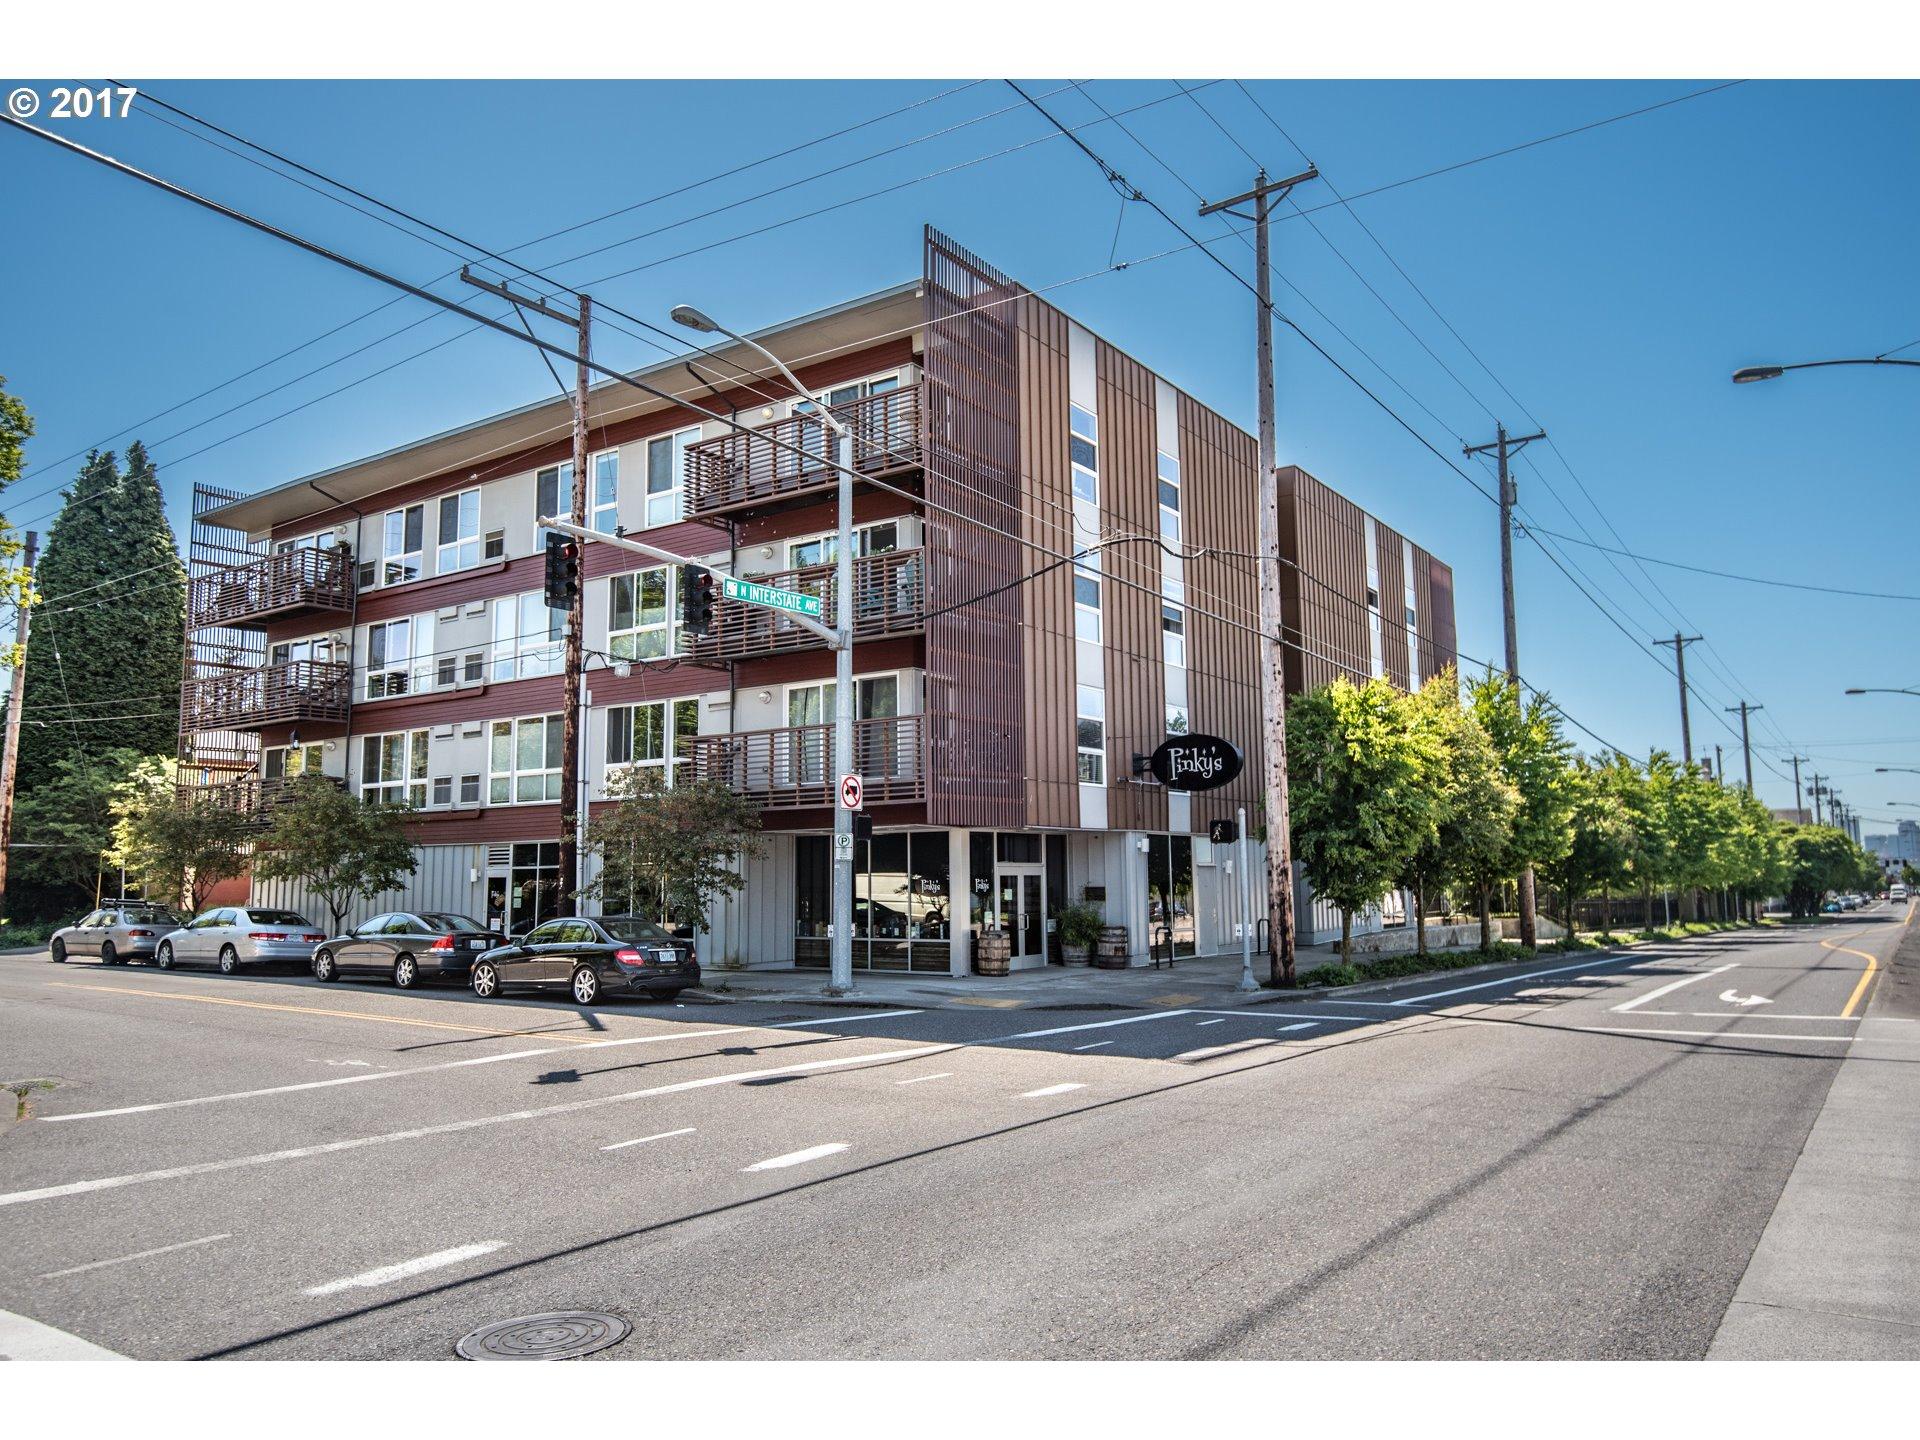 3970 N INTERSTATE AVE 404, Portland, OR 97227